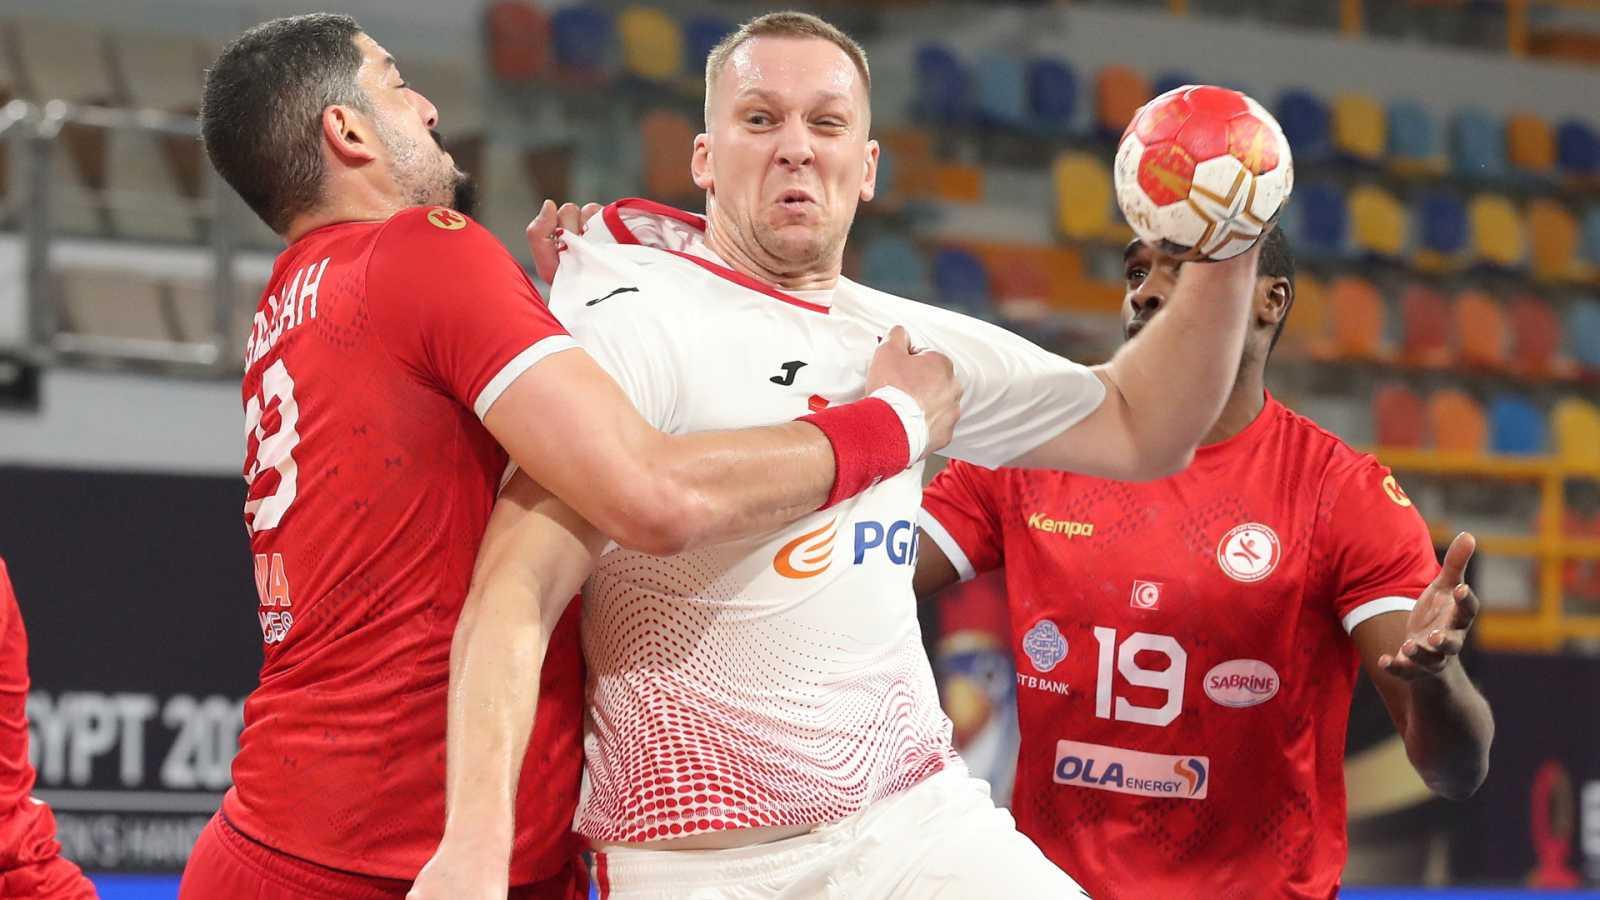 Balonmano - Campeonato del Mundo masculino: Túnez - Polonia - ver ahora